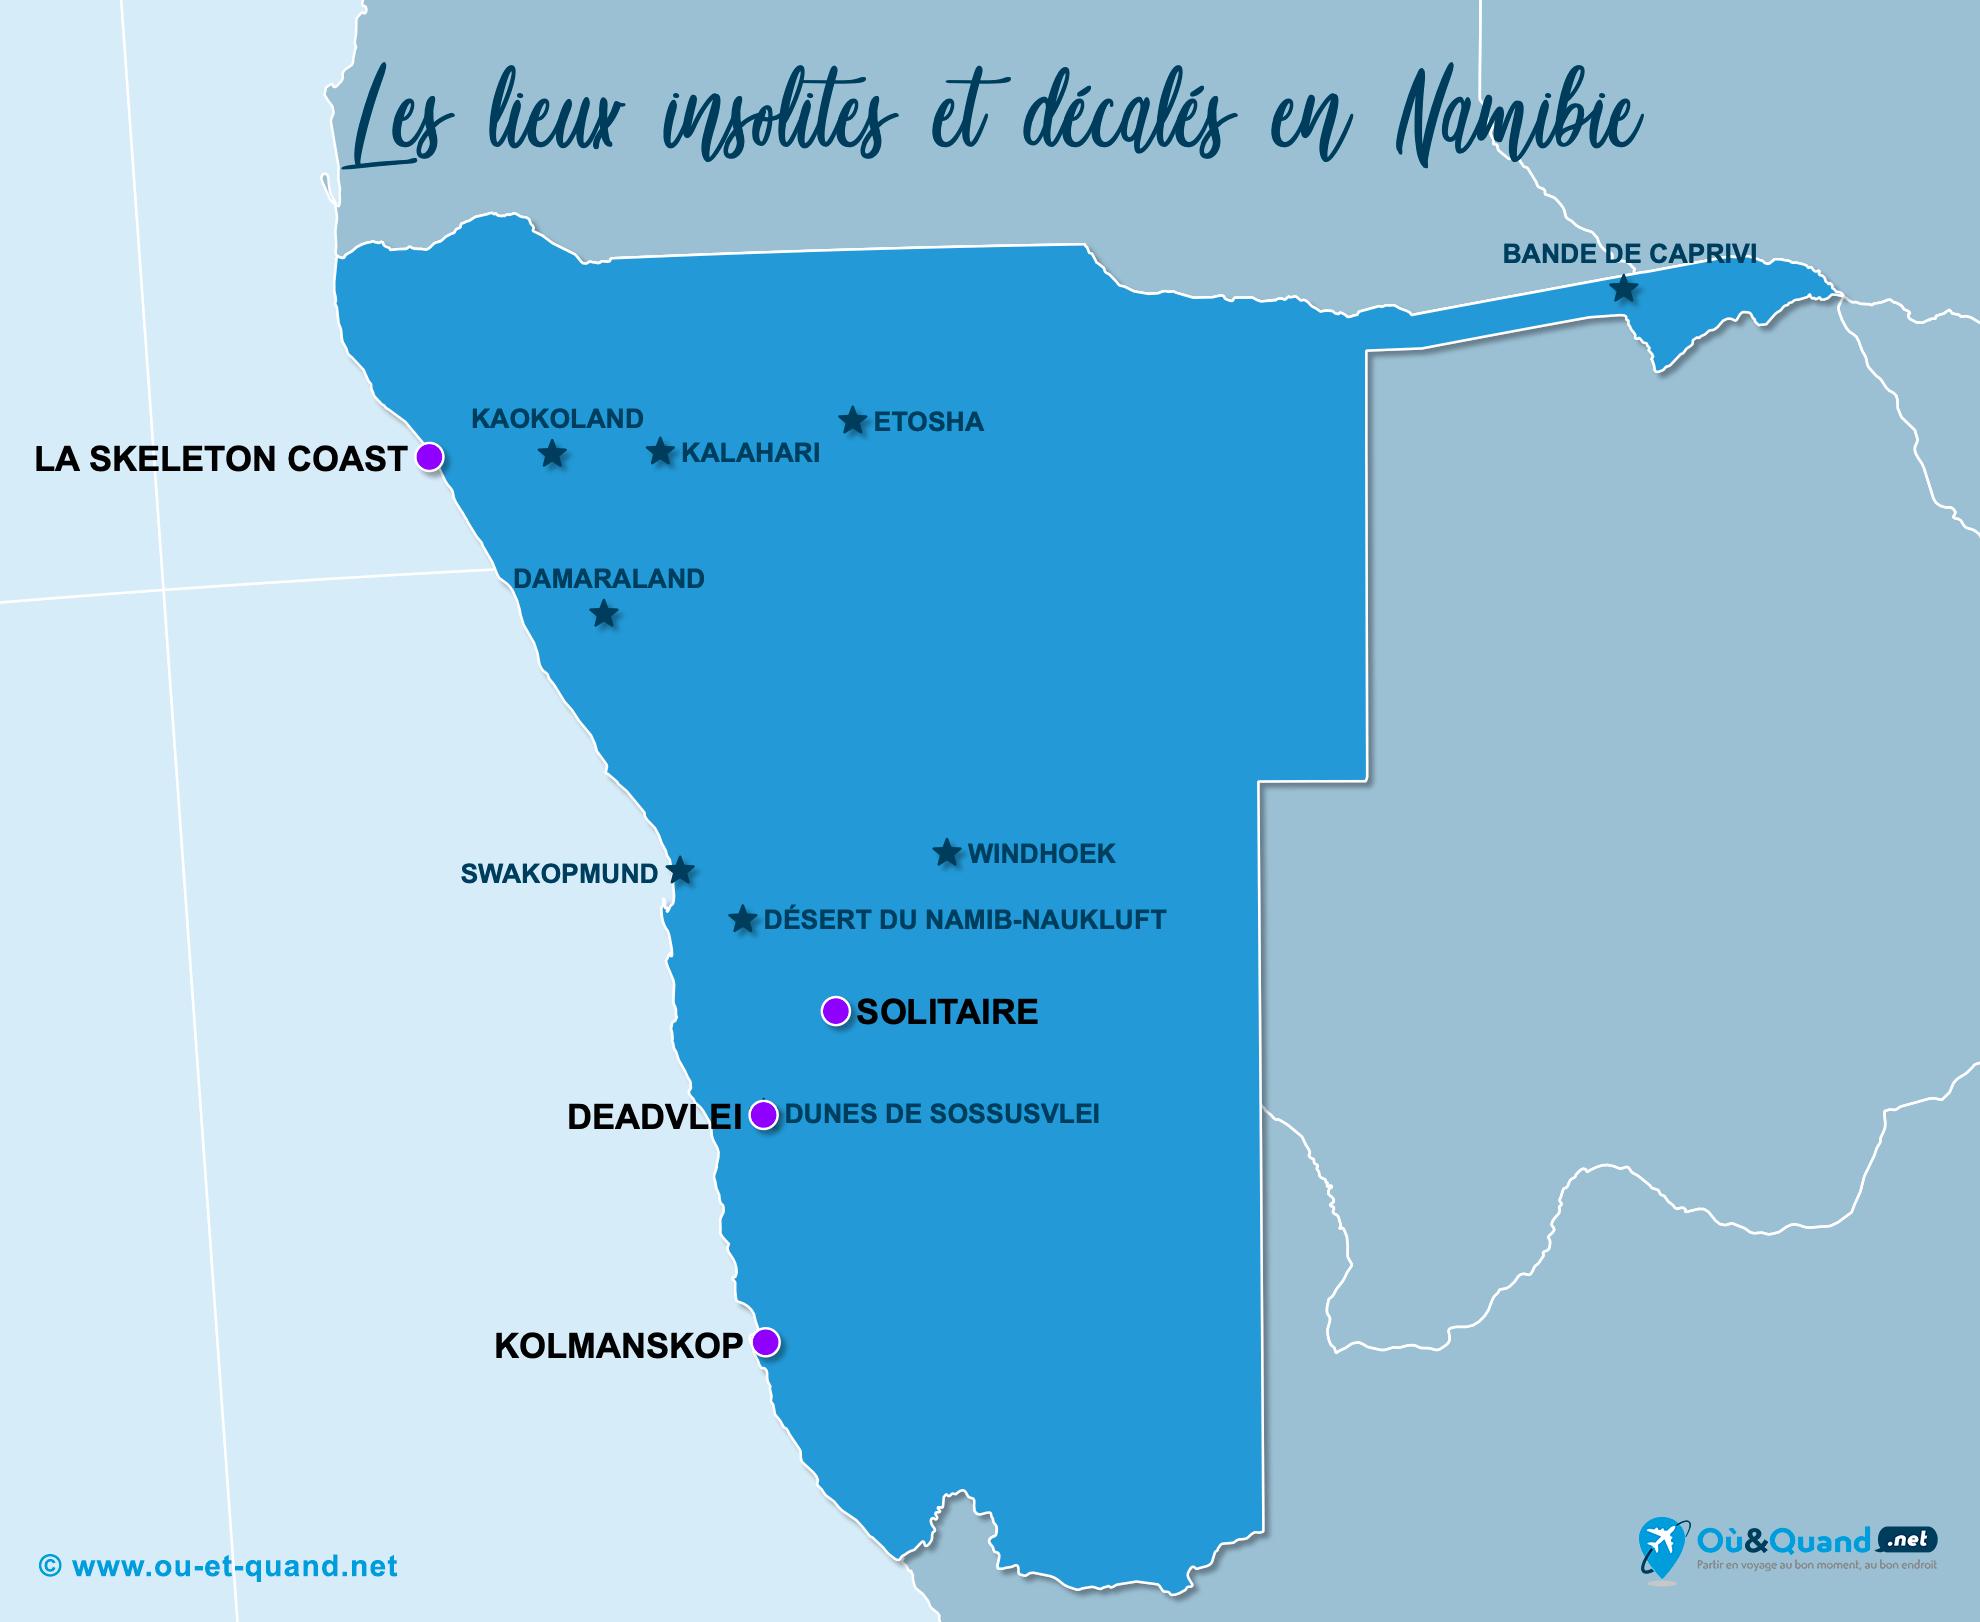 Carte Namibie : La Namibie insolite